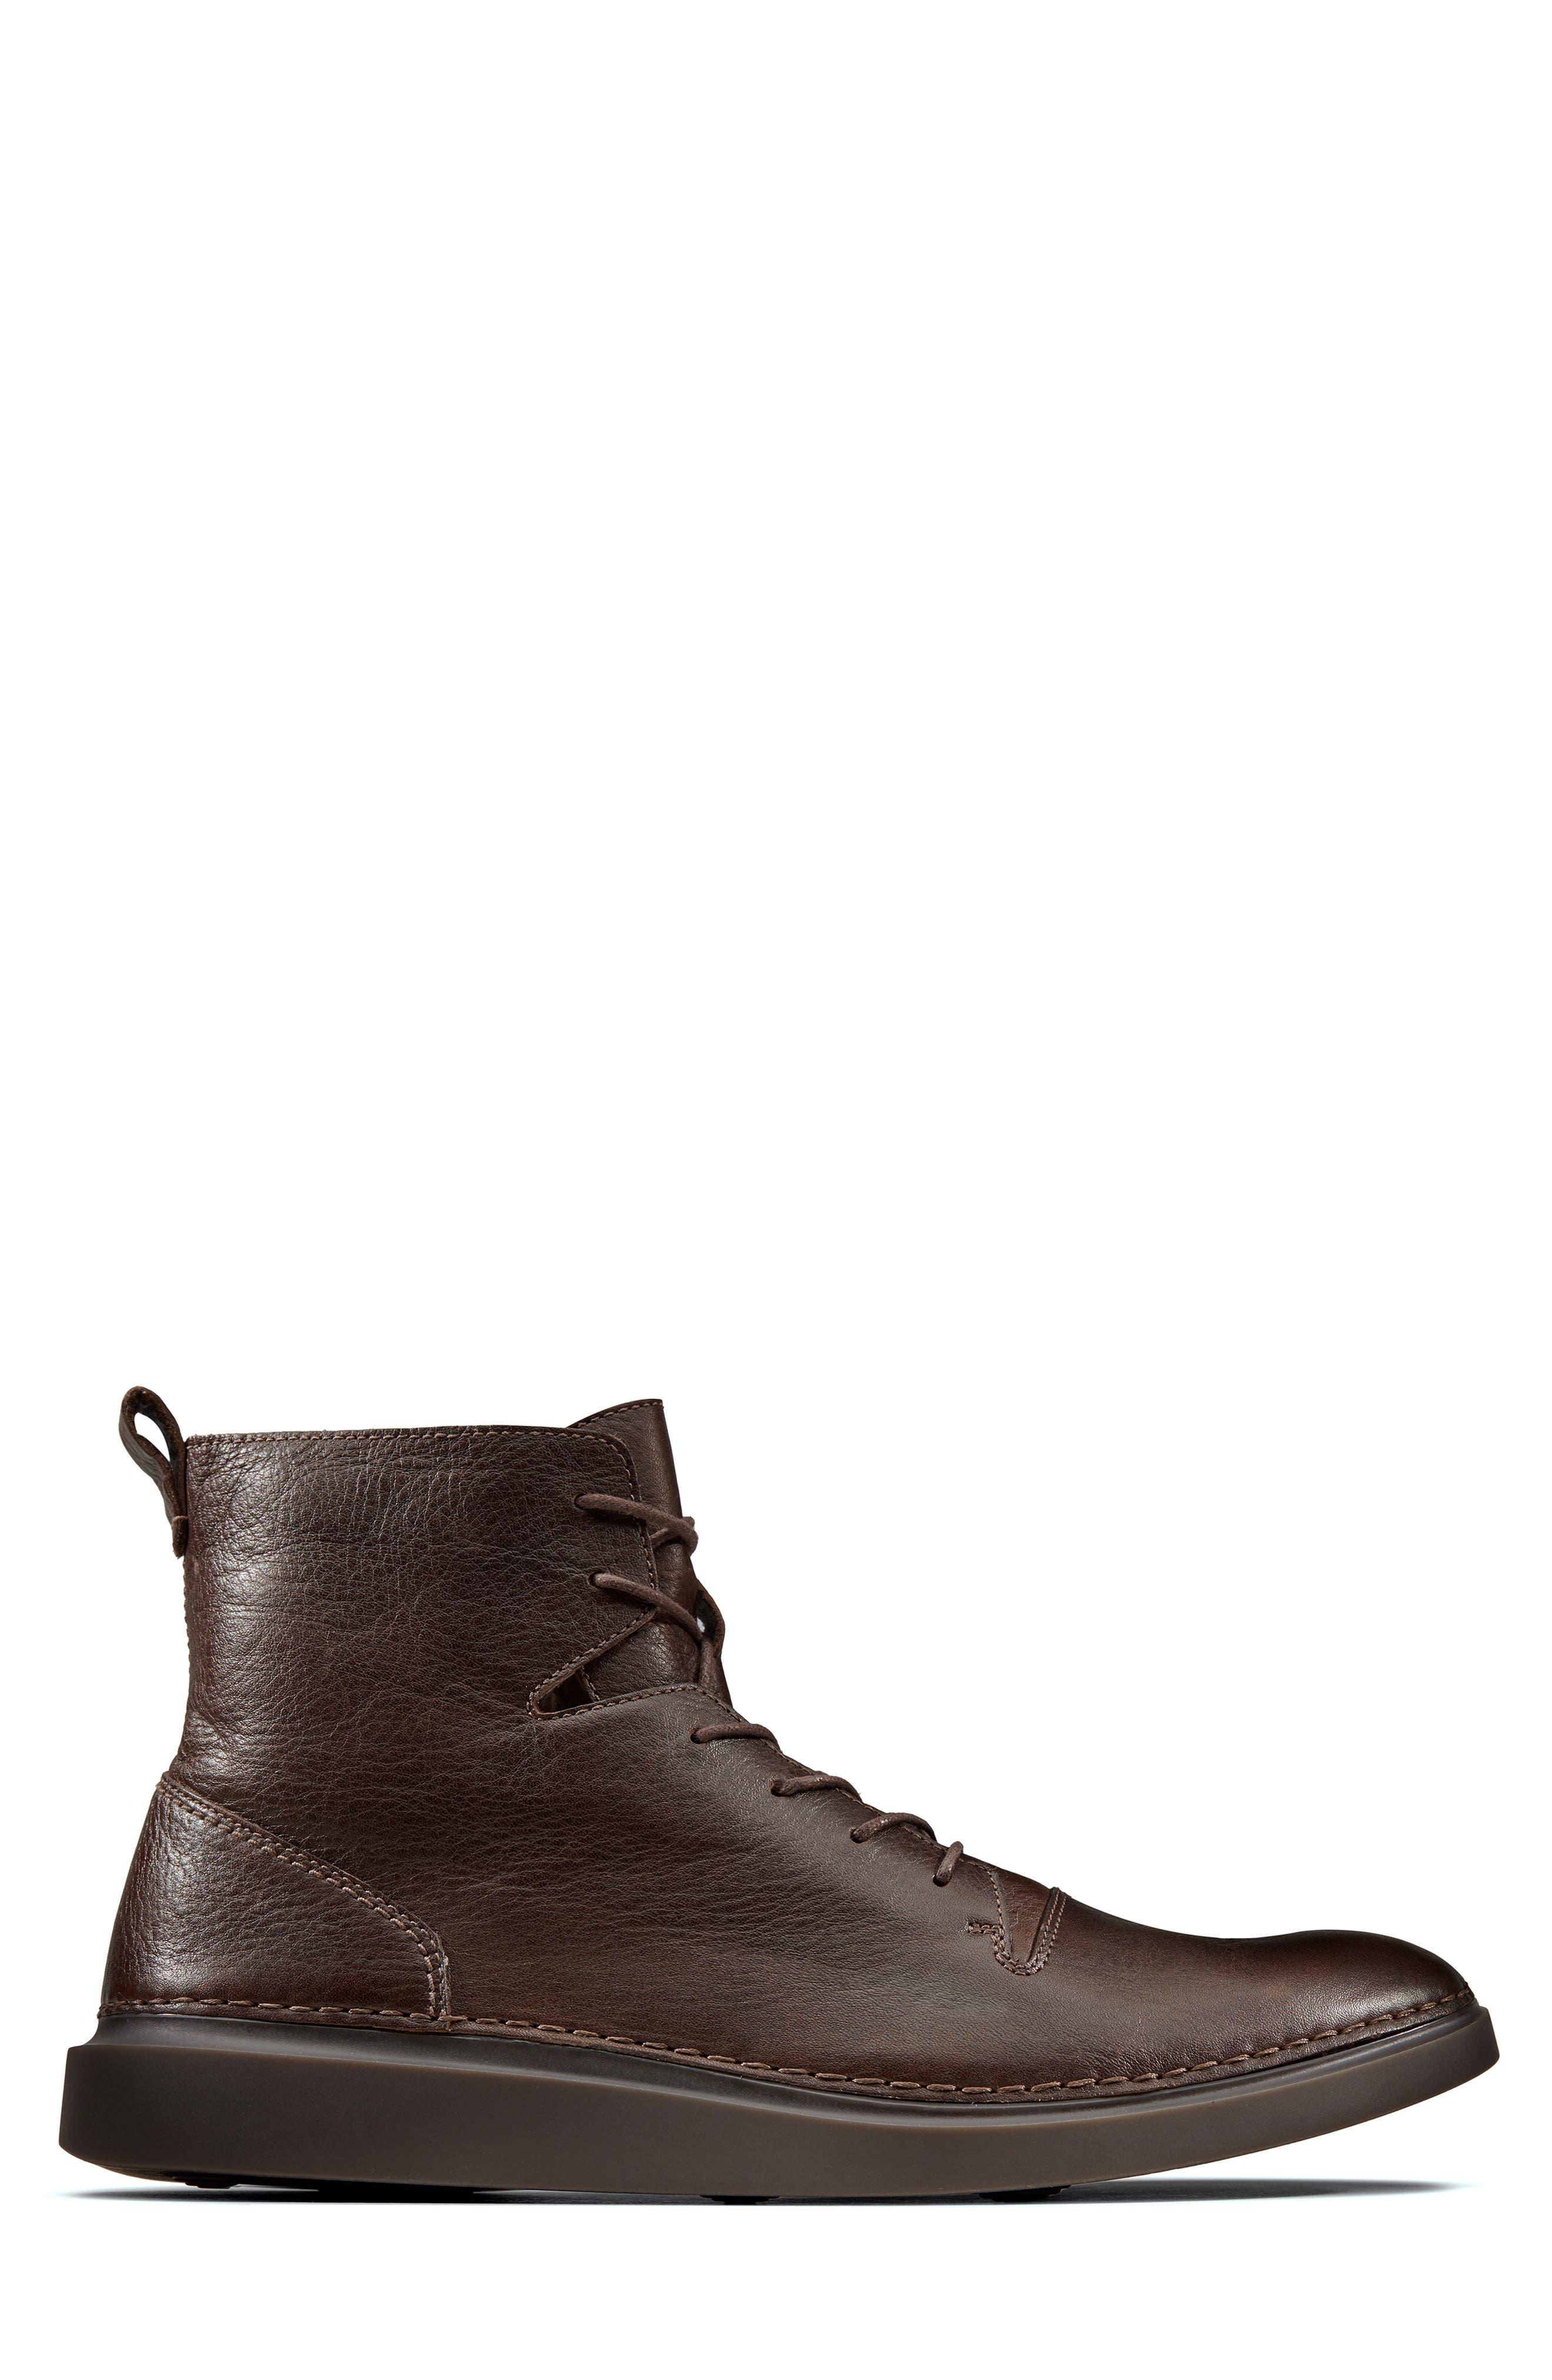 Hale Rise Plain Toe Boot,                             Alternate thumbnail 2, color,                             213